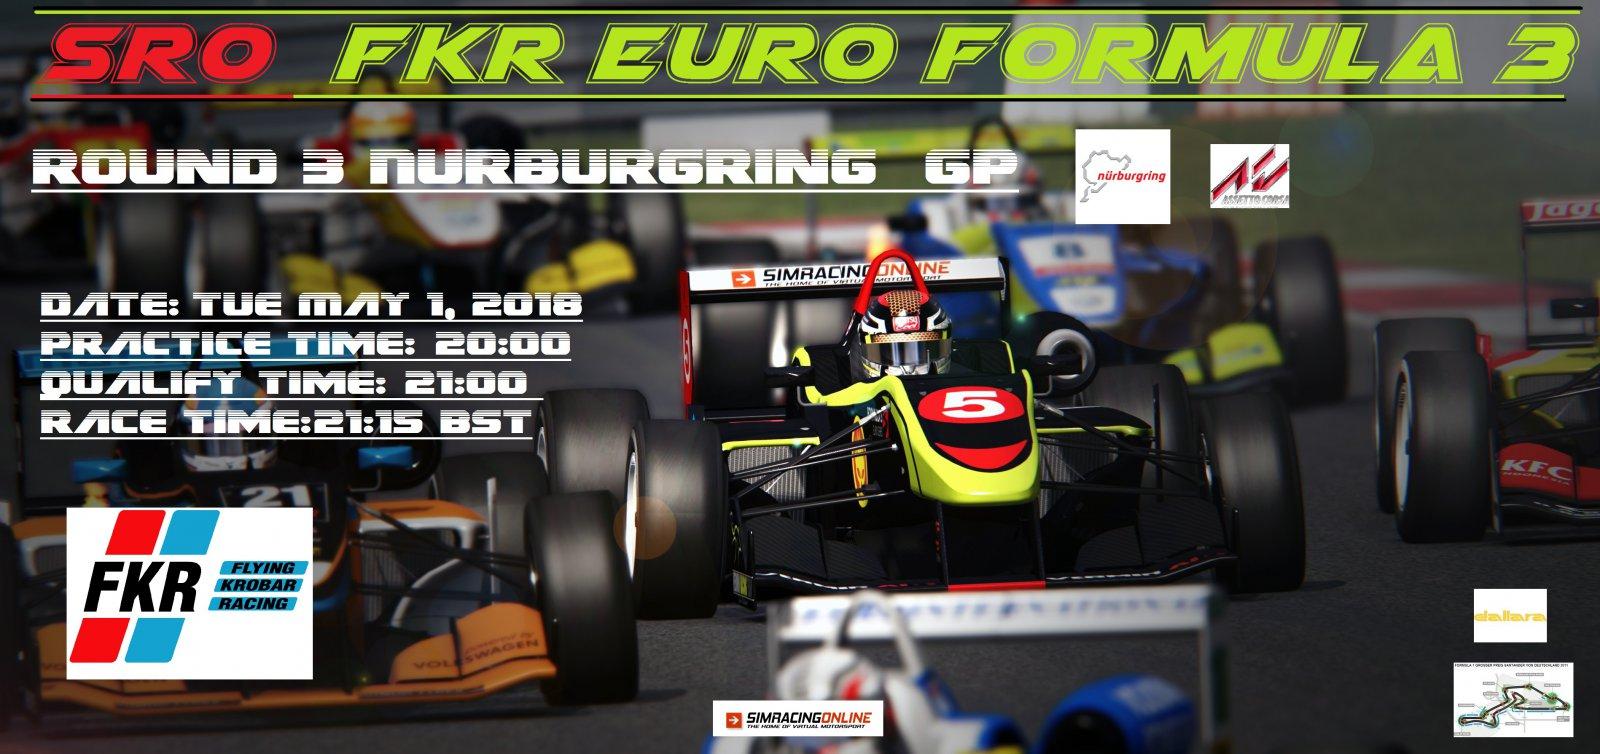 Screenshot_dallara_f312_ks_nurburgring_22-4-118-19-34-13k.jpg